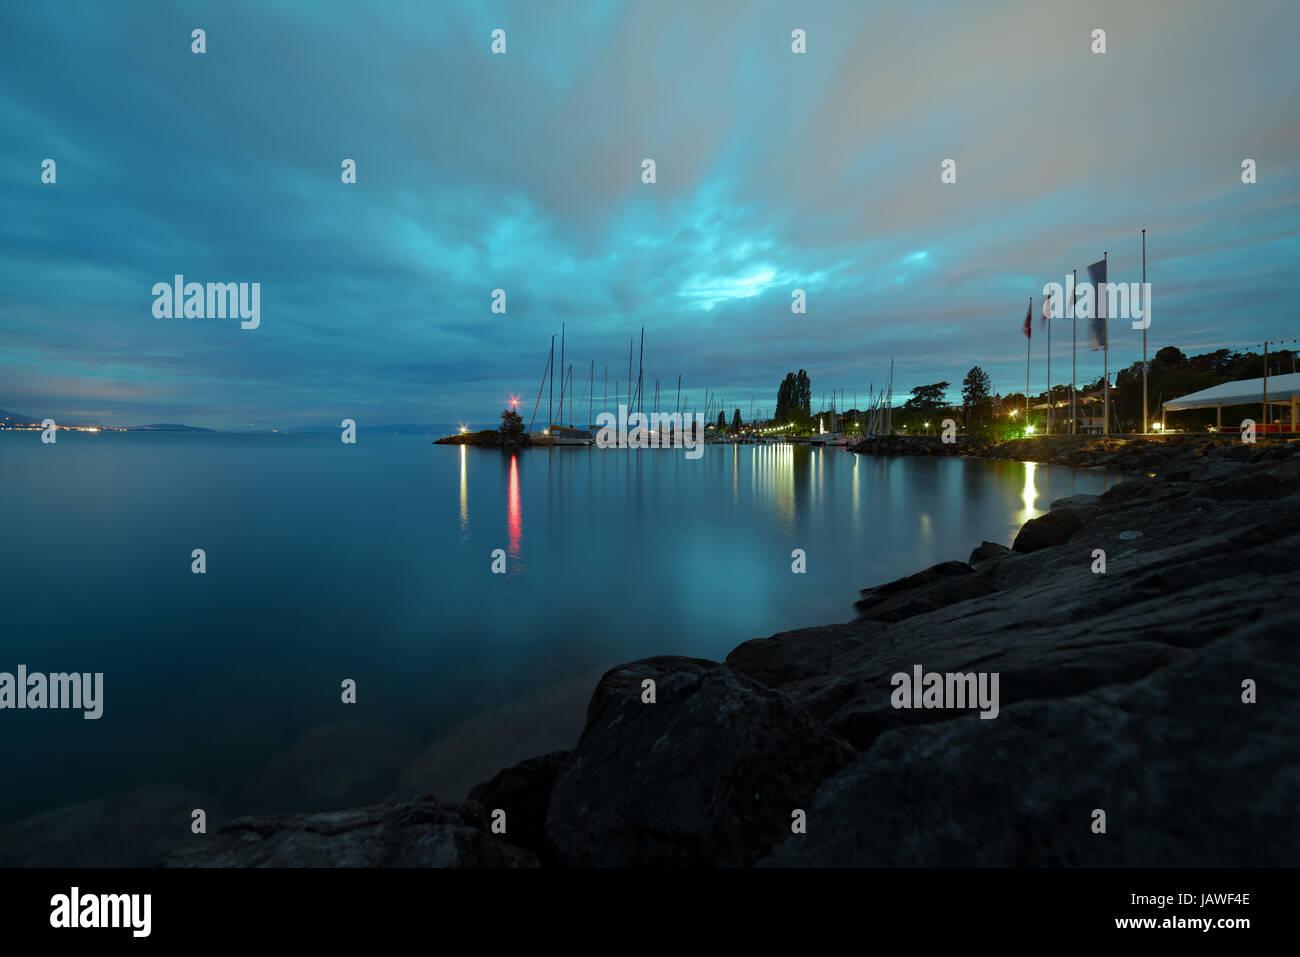 Nightfall at Pully in Switzerland by Lake Leman (Lake Geneva) - Stock Image